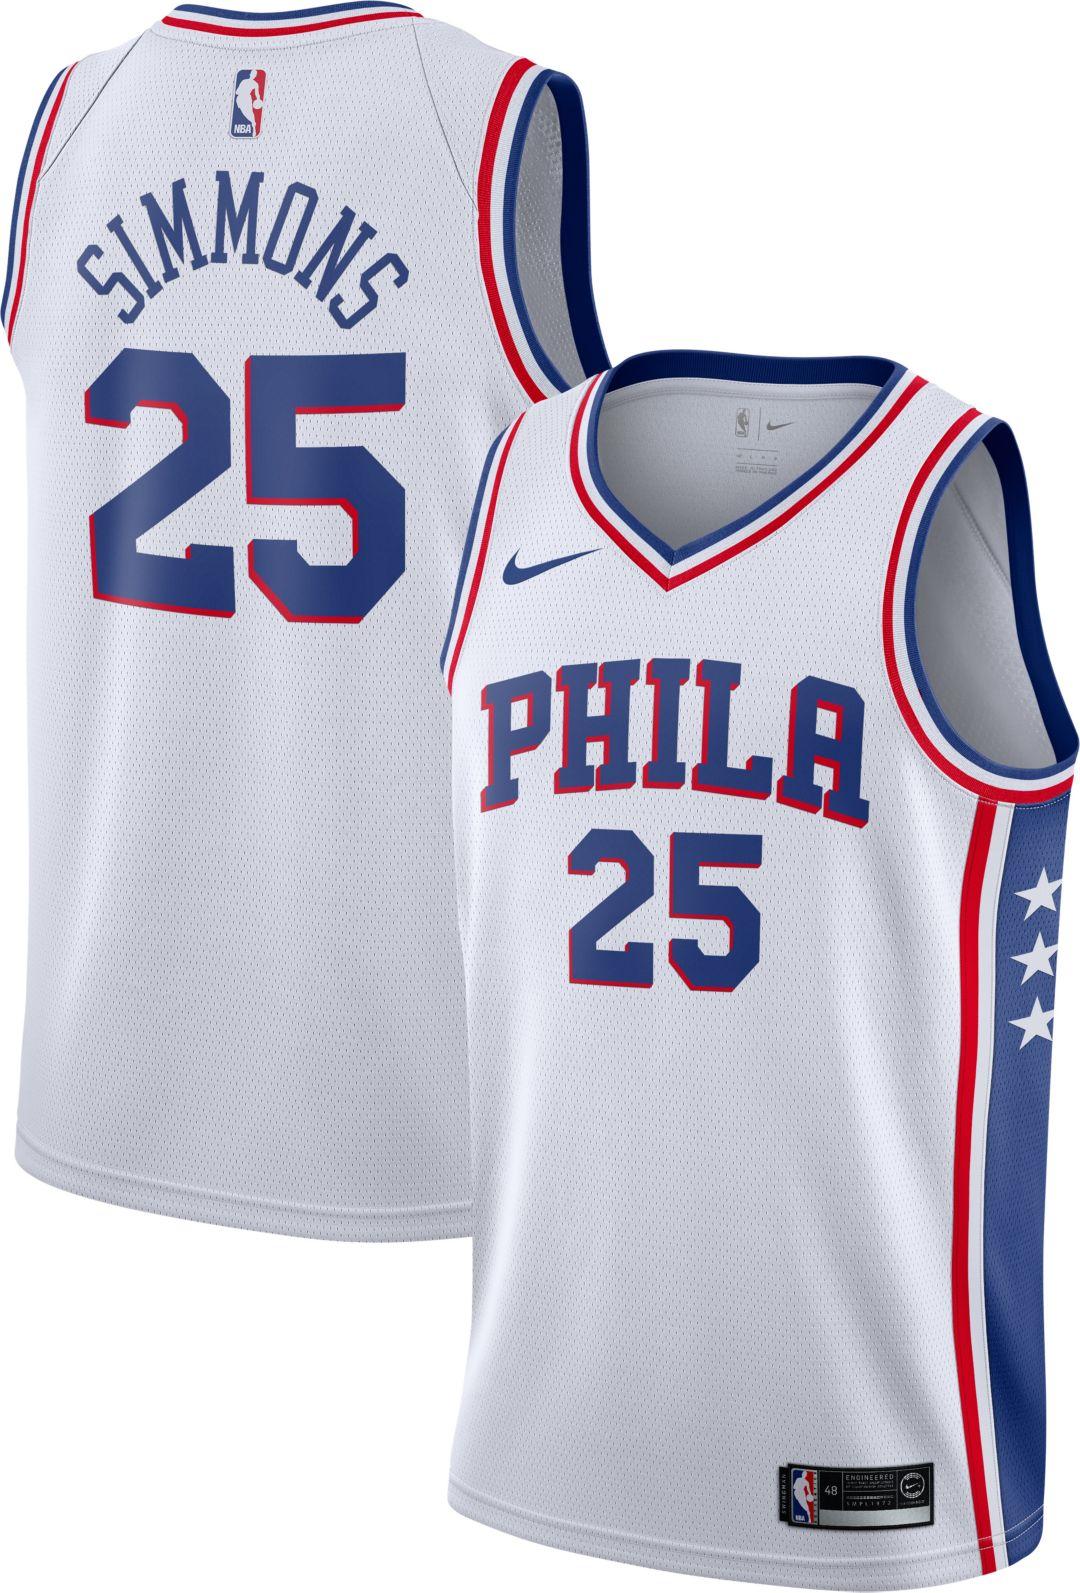 quality design e59e9 fd056 Nike Men's Philadelphia 76ers Ben Simmons #25 White Dri-FIT Swingman Jersey